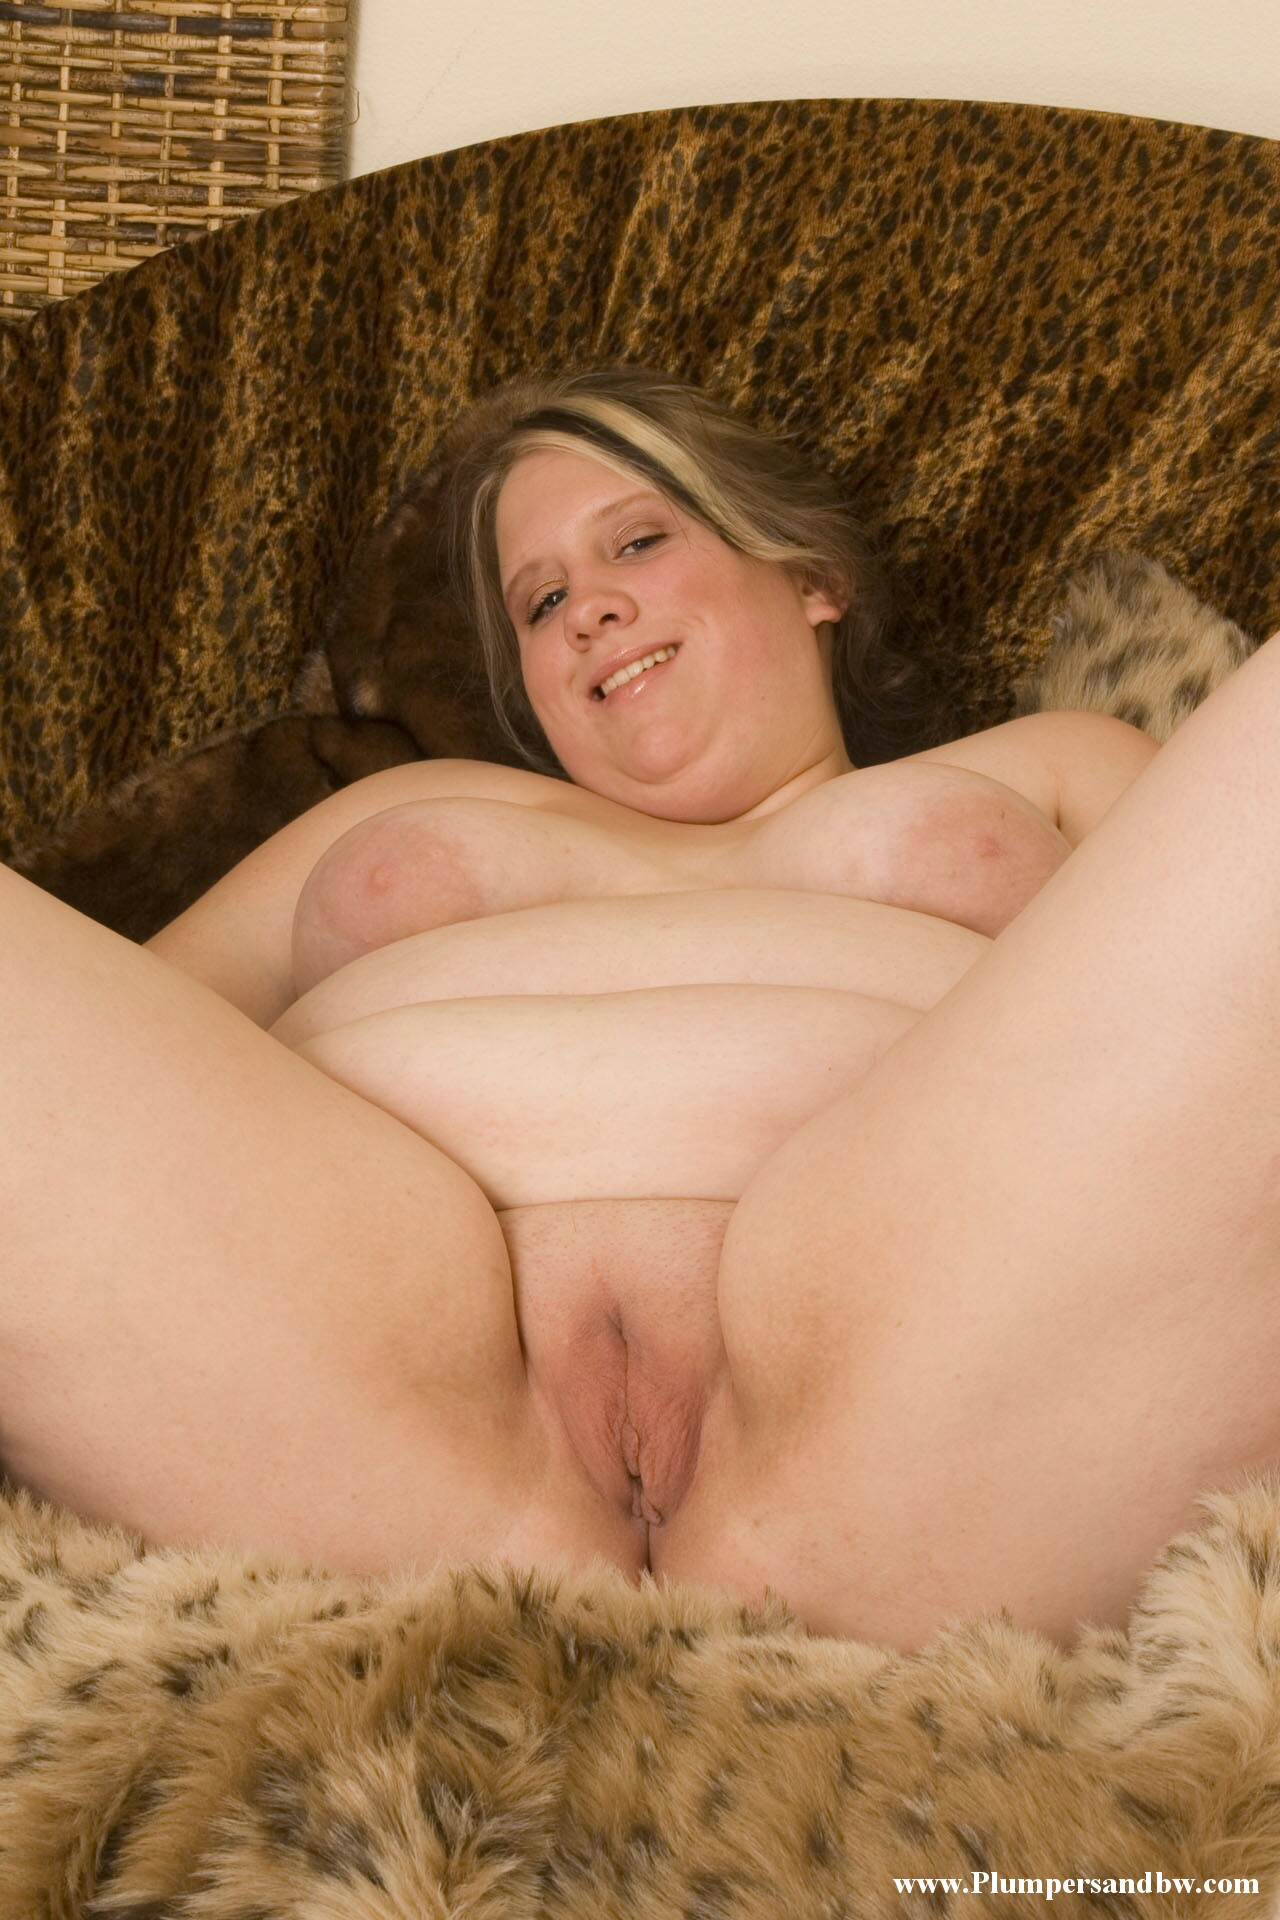 Free bbw nude gallerys suggest